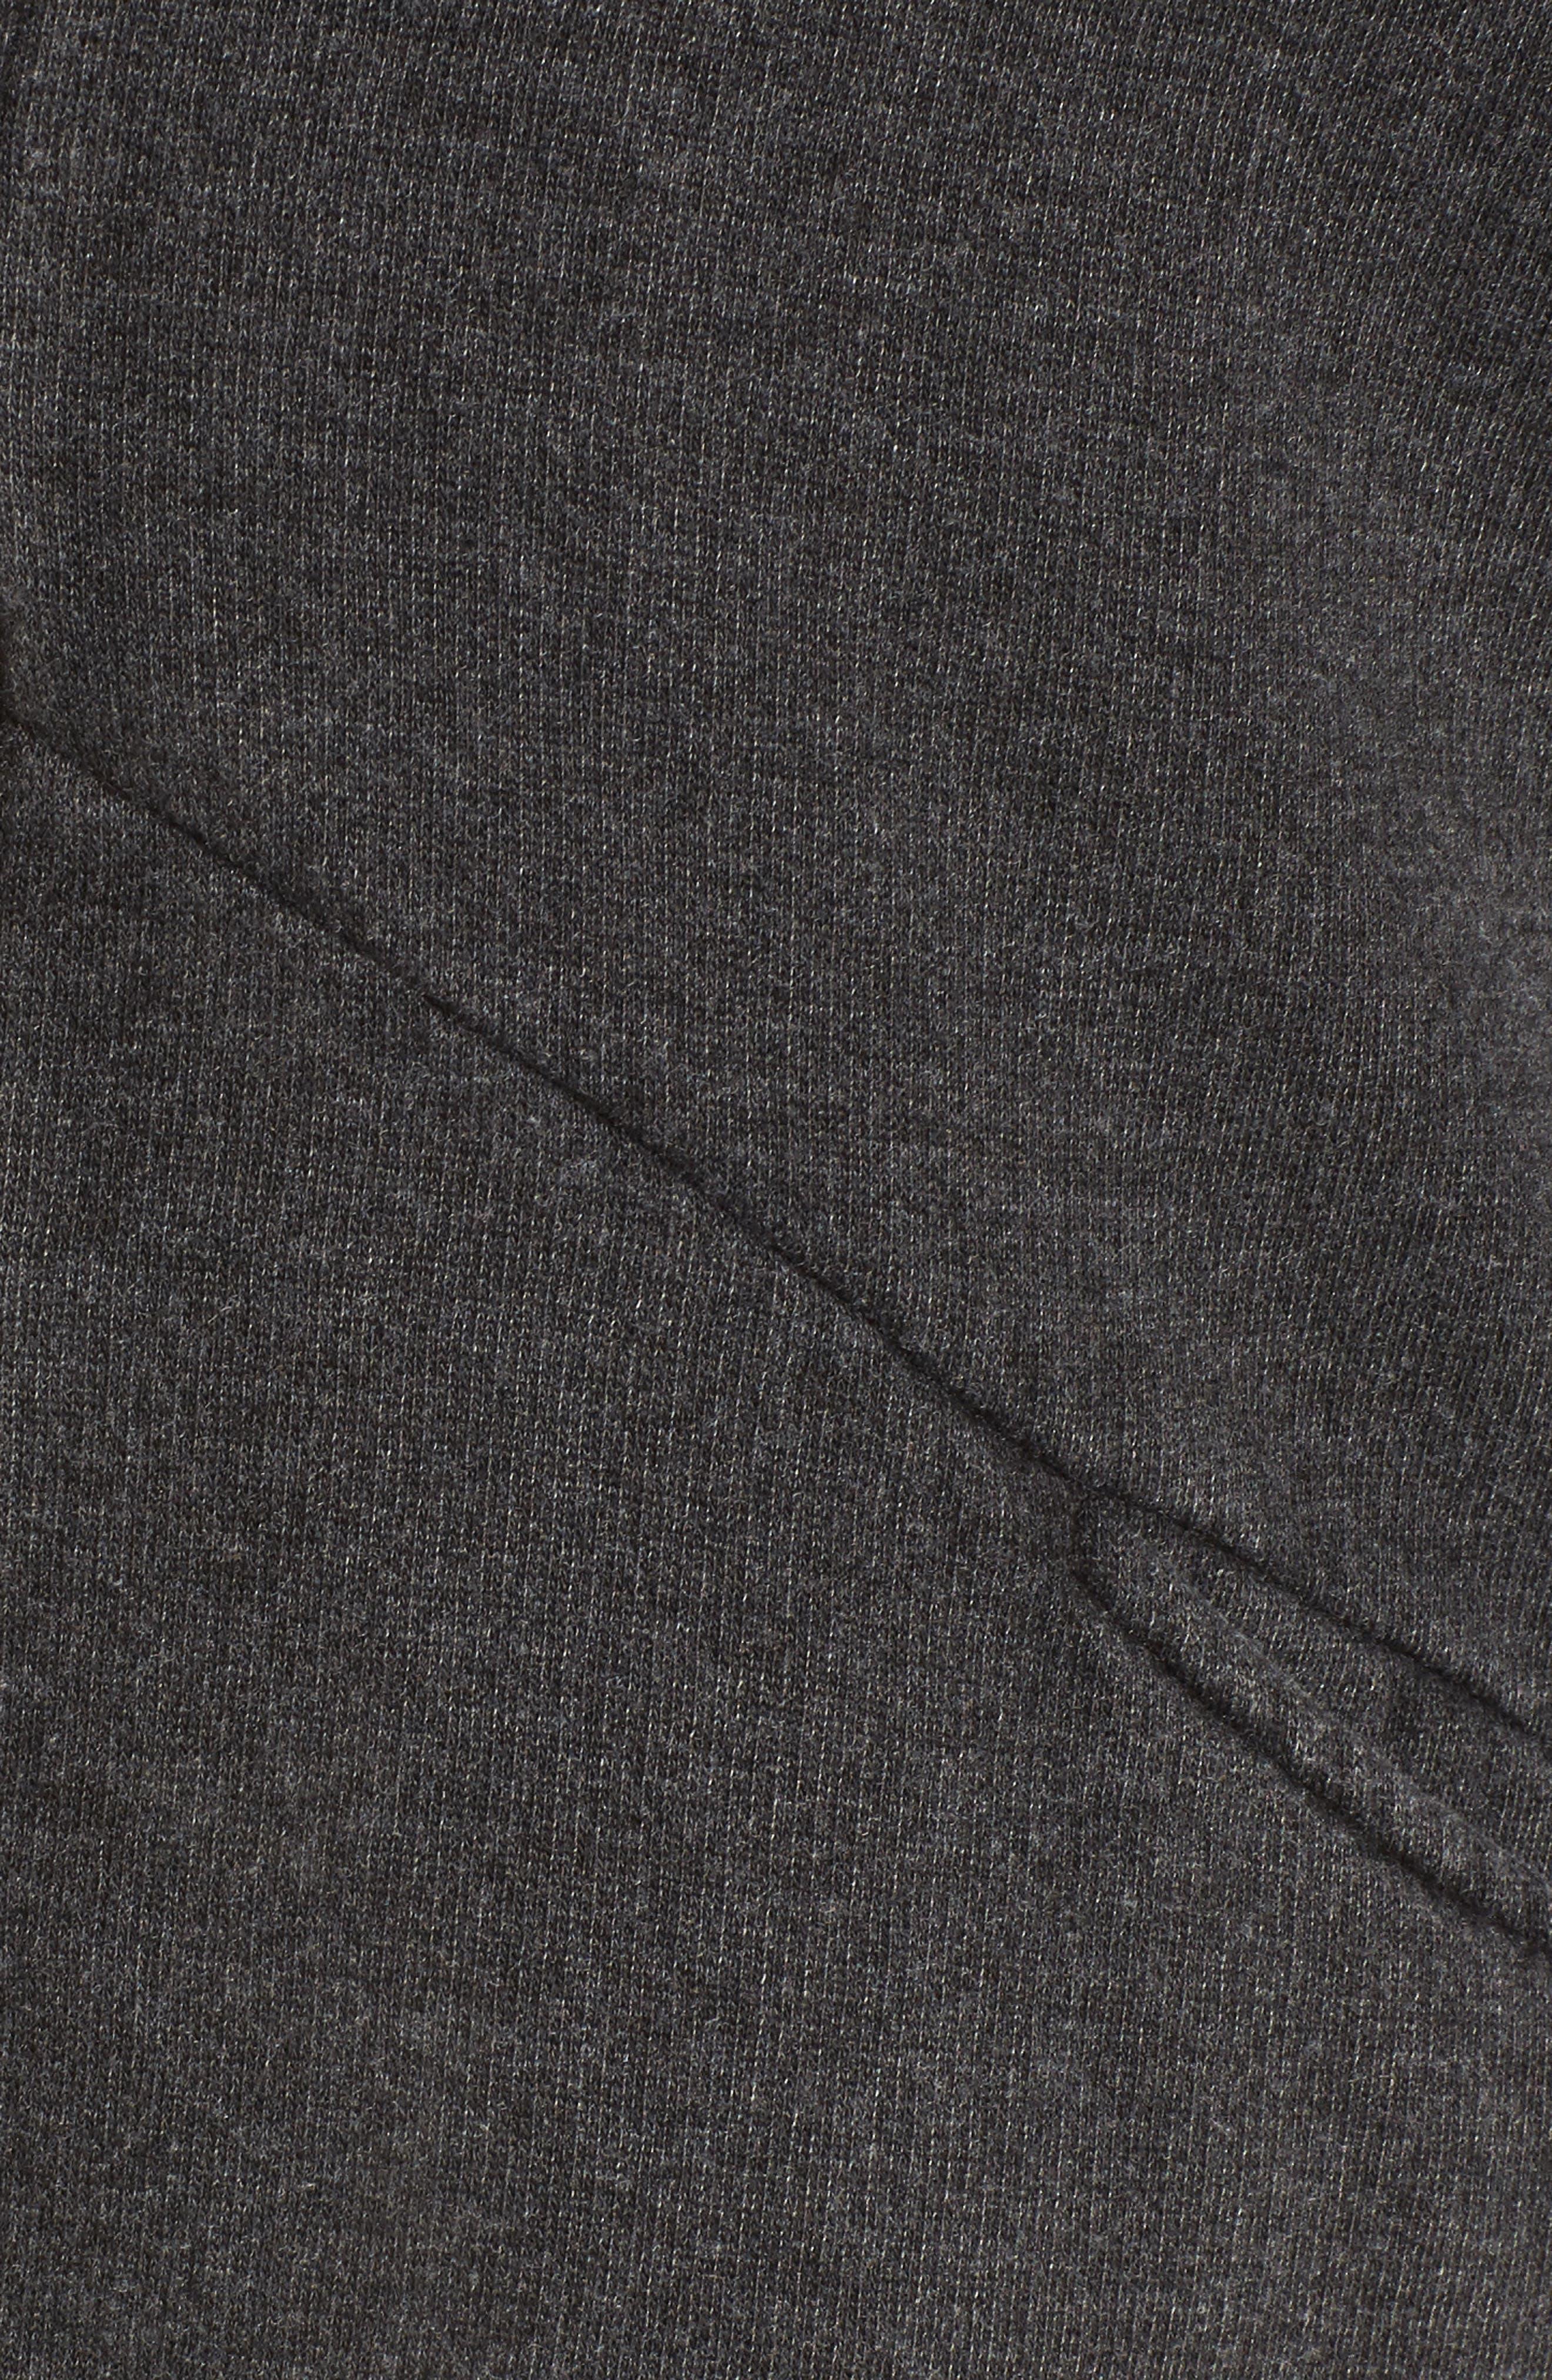 Lace-Up Back Cardigan,                             Alternate thumbnail 5, color,                             001